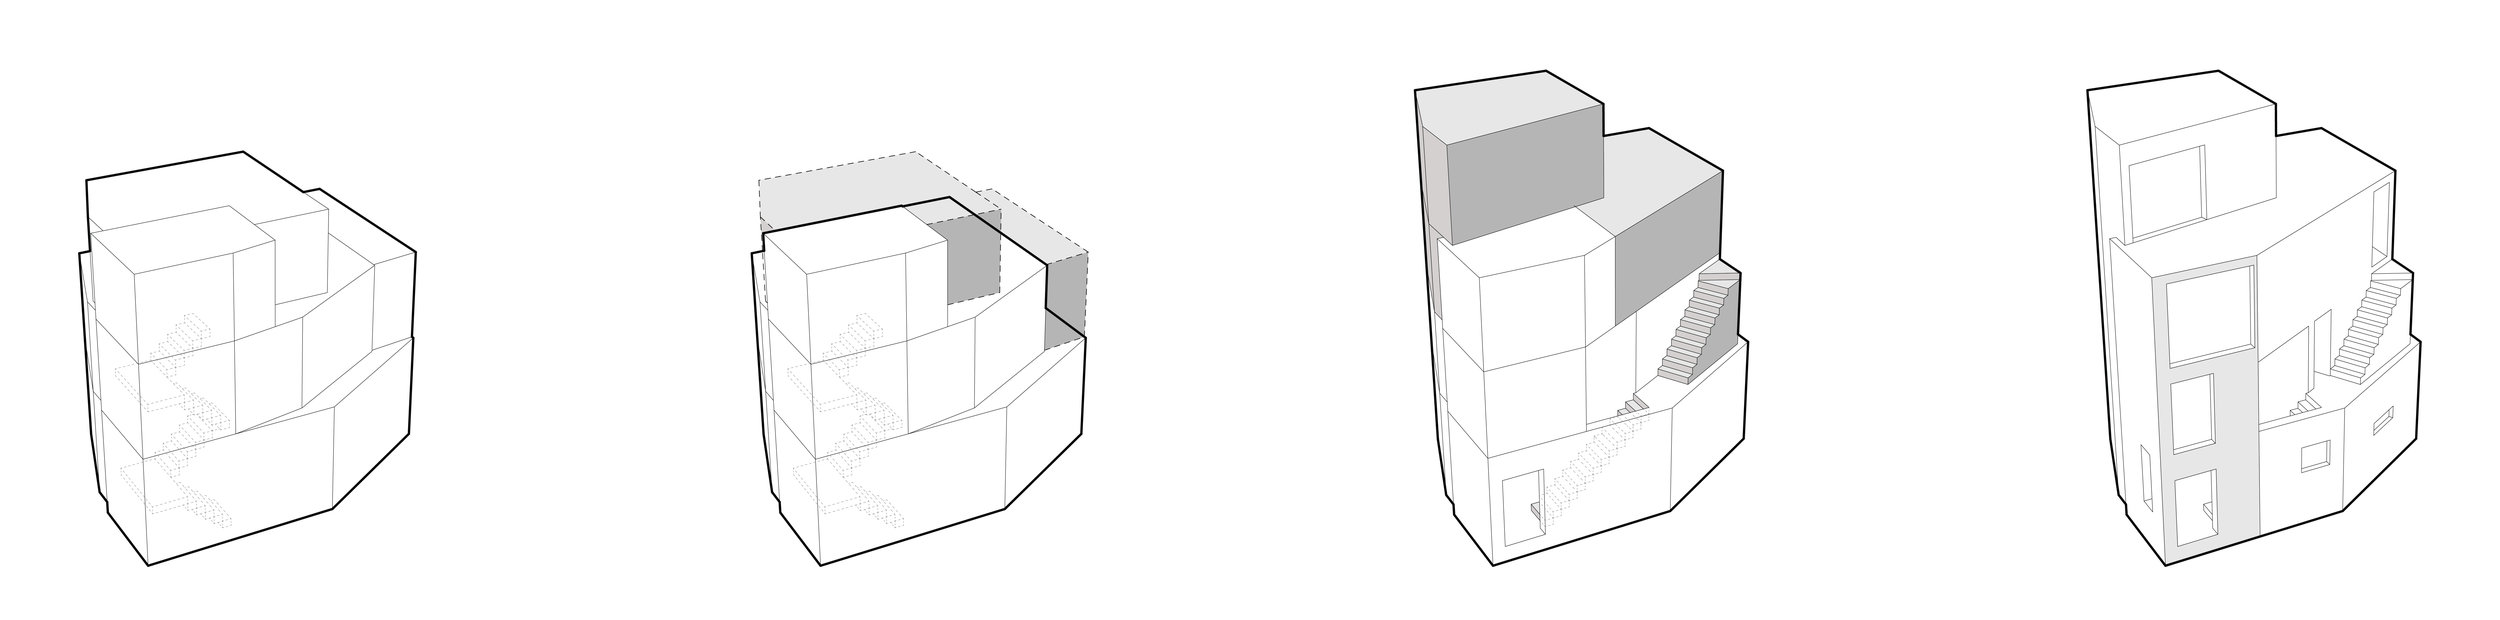 existing                         demolition                      exp  ansion                      façade